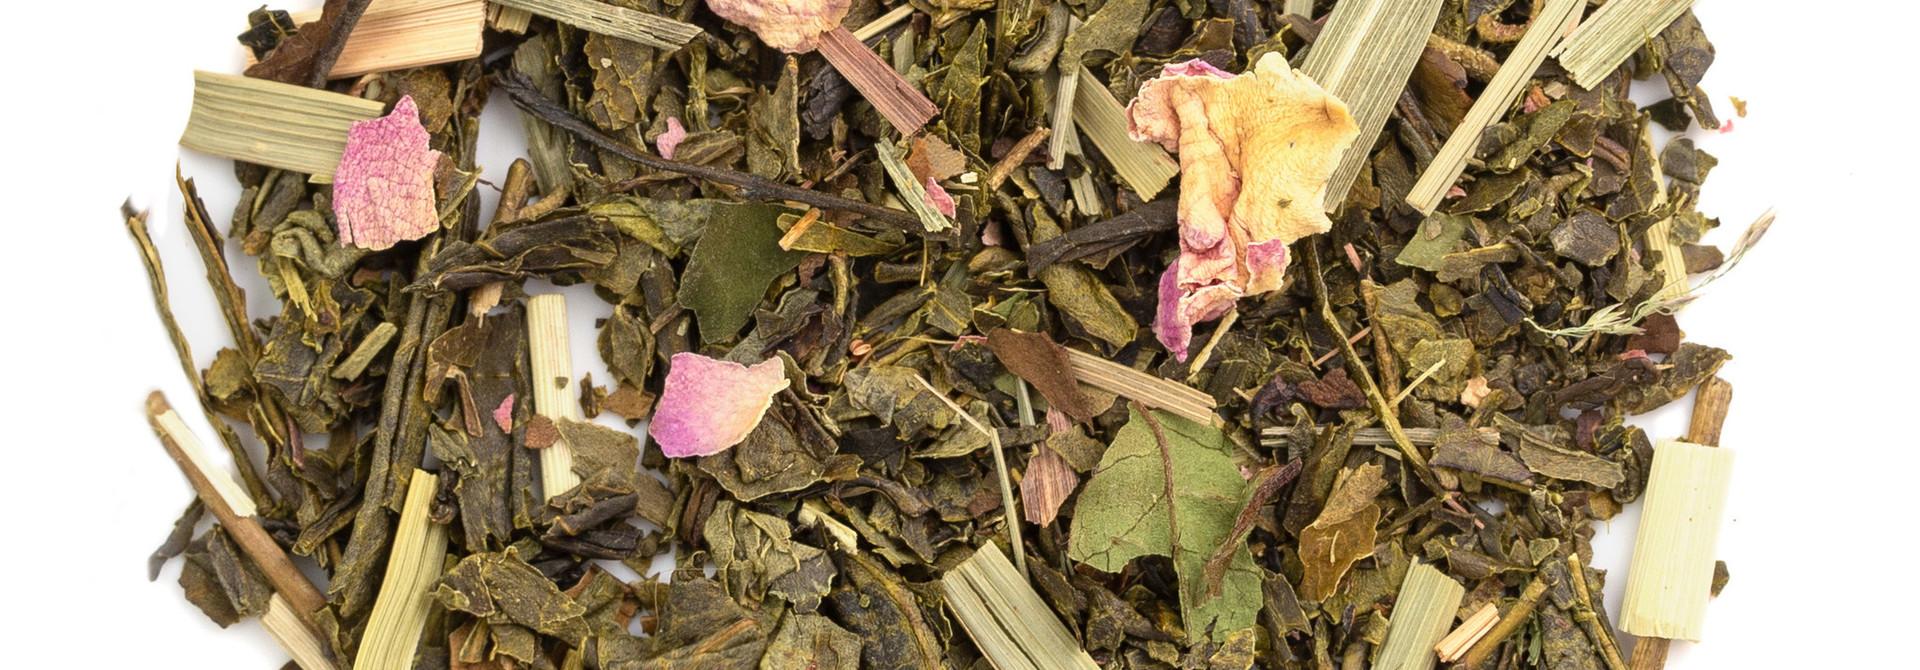 Lady in Pink met frambozen bergamot smaak